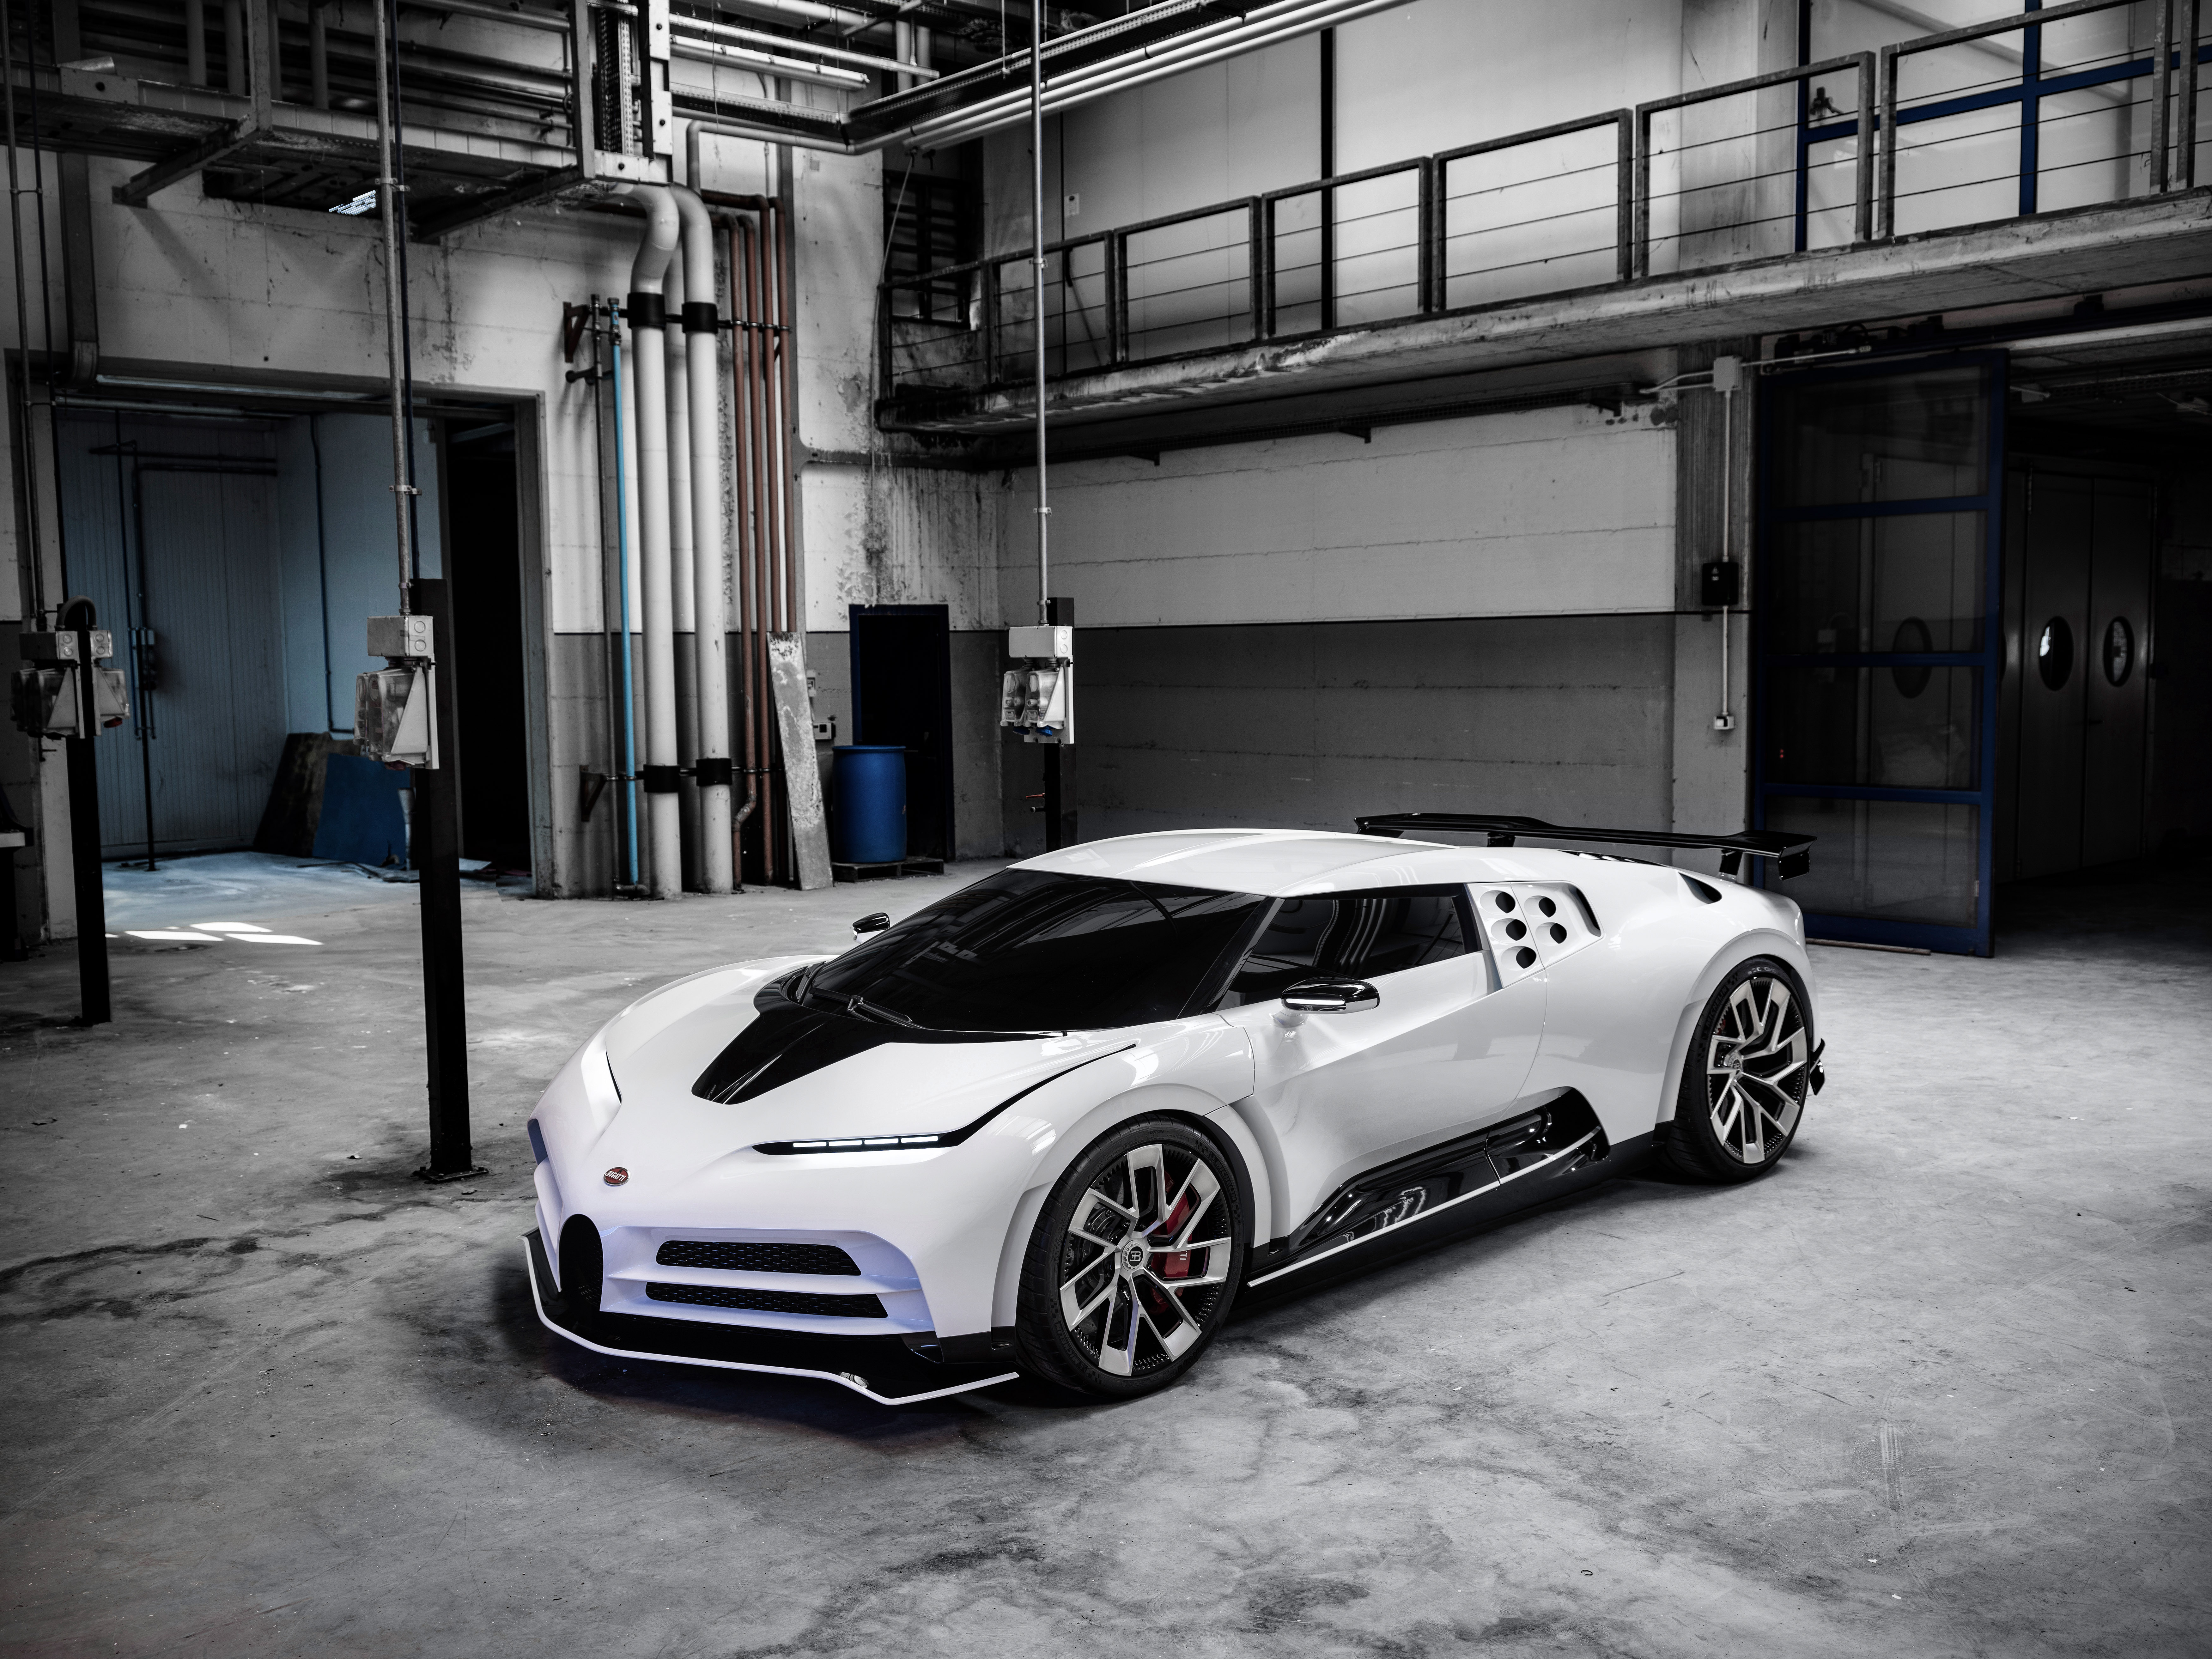 2020 Bugatti Centodieci 5k Retina Ultra Fond D Ecran Hd